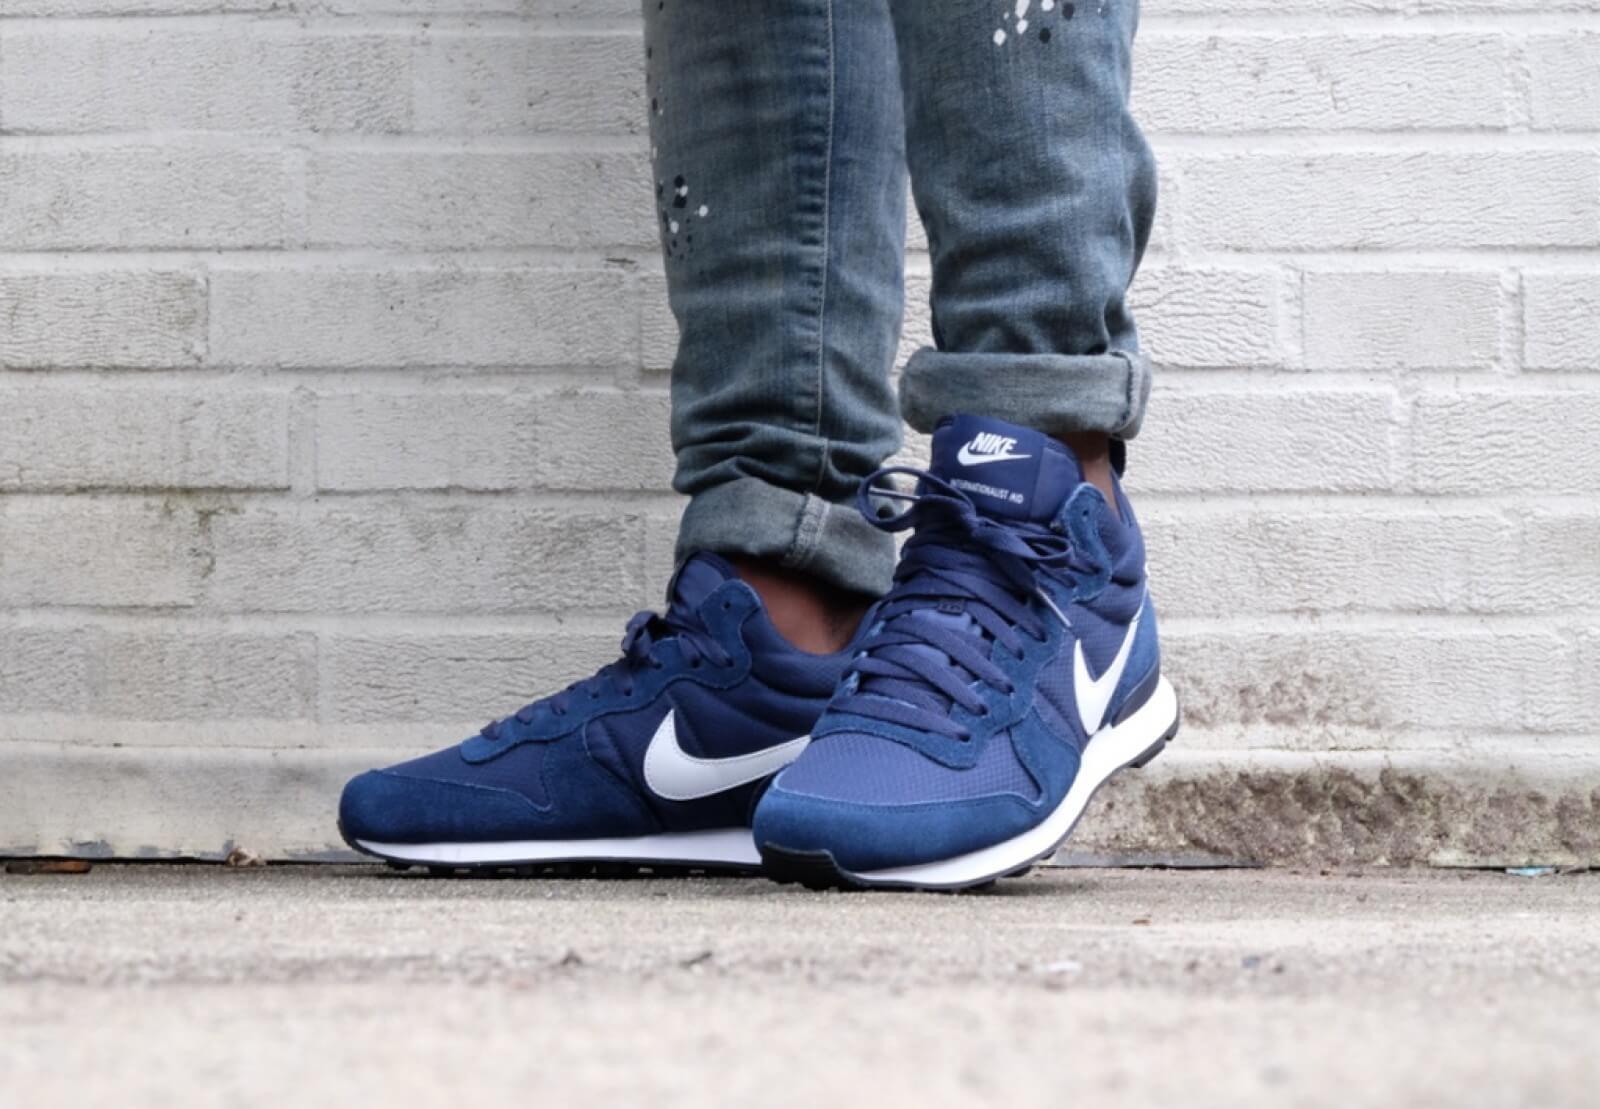 Nike Internationalist Mid Midnight Navy